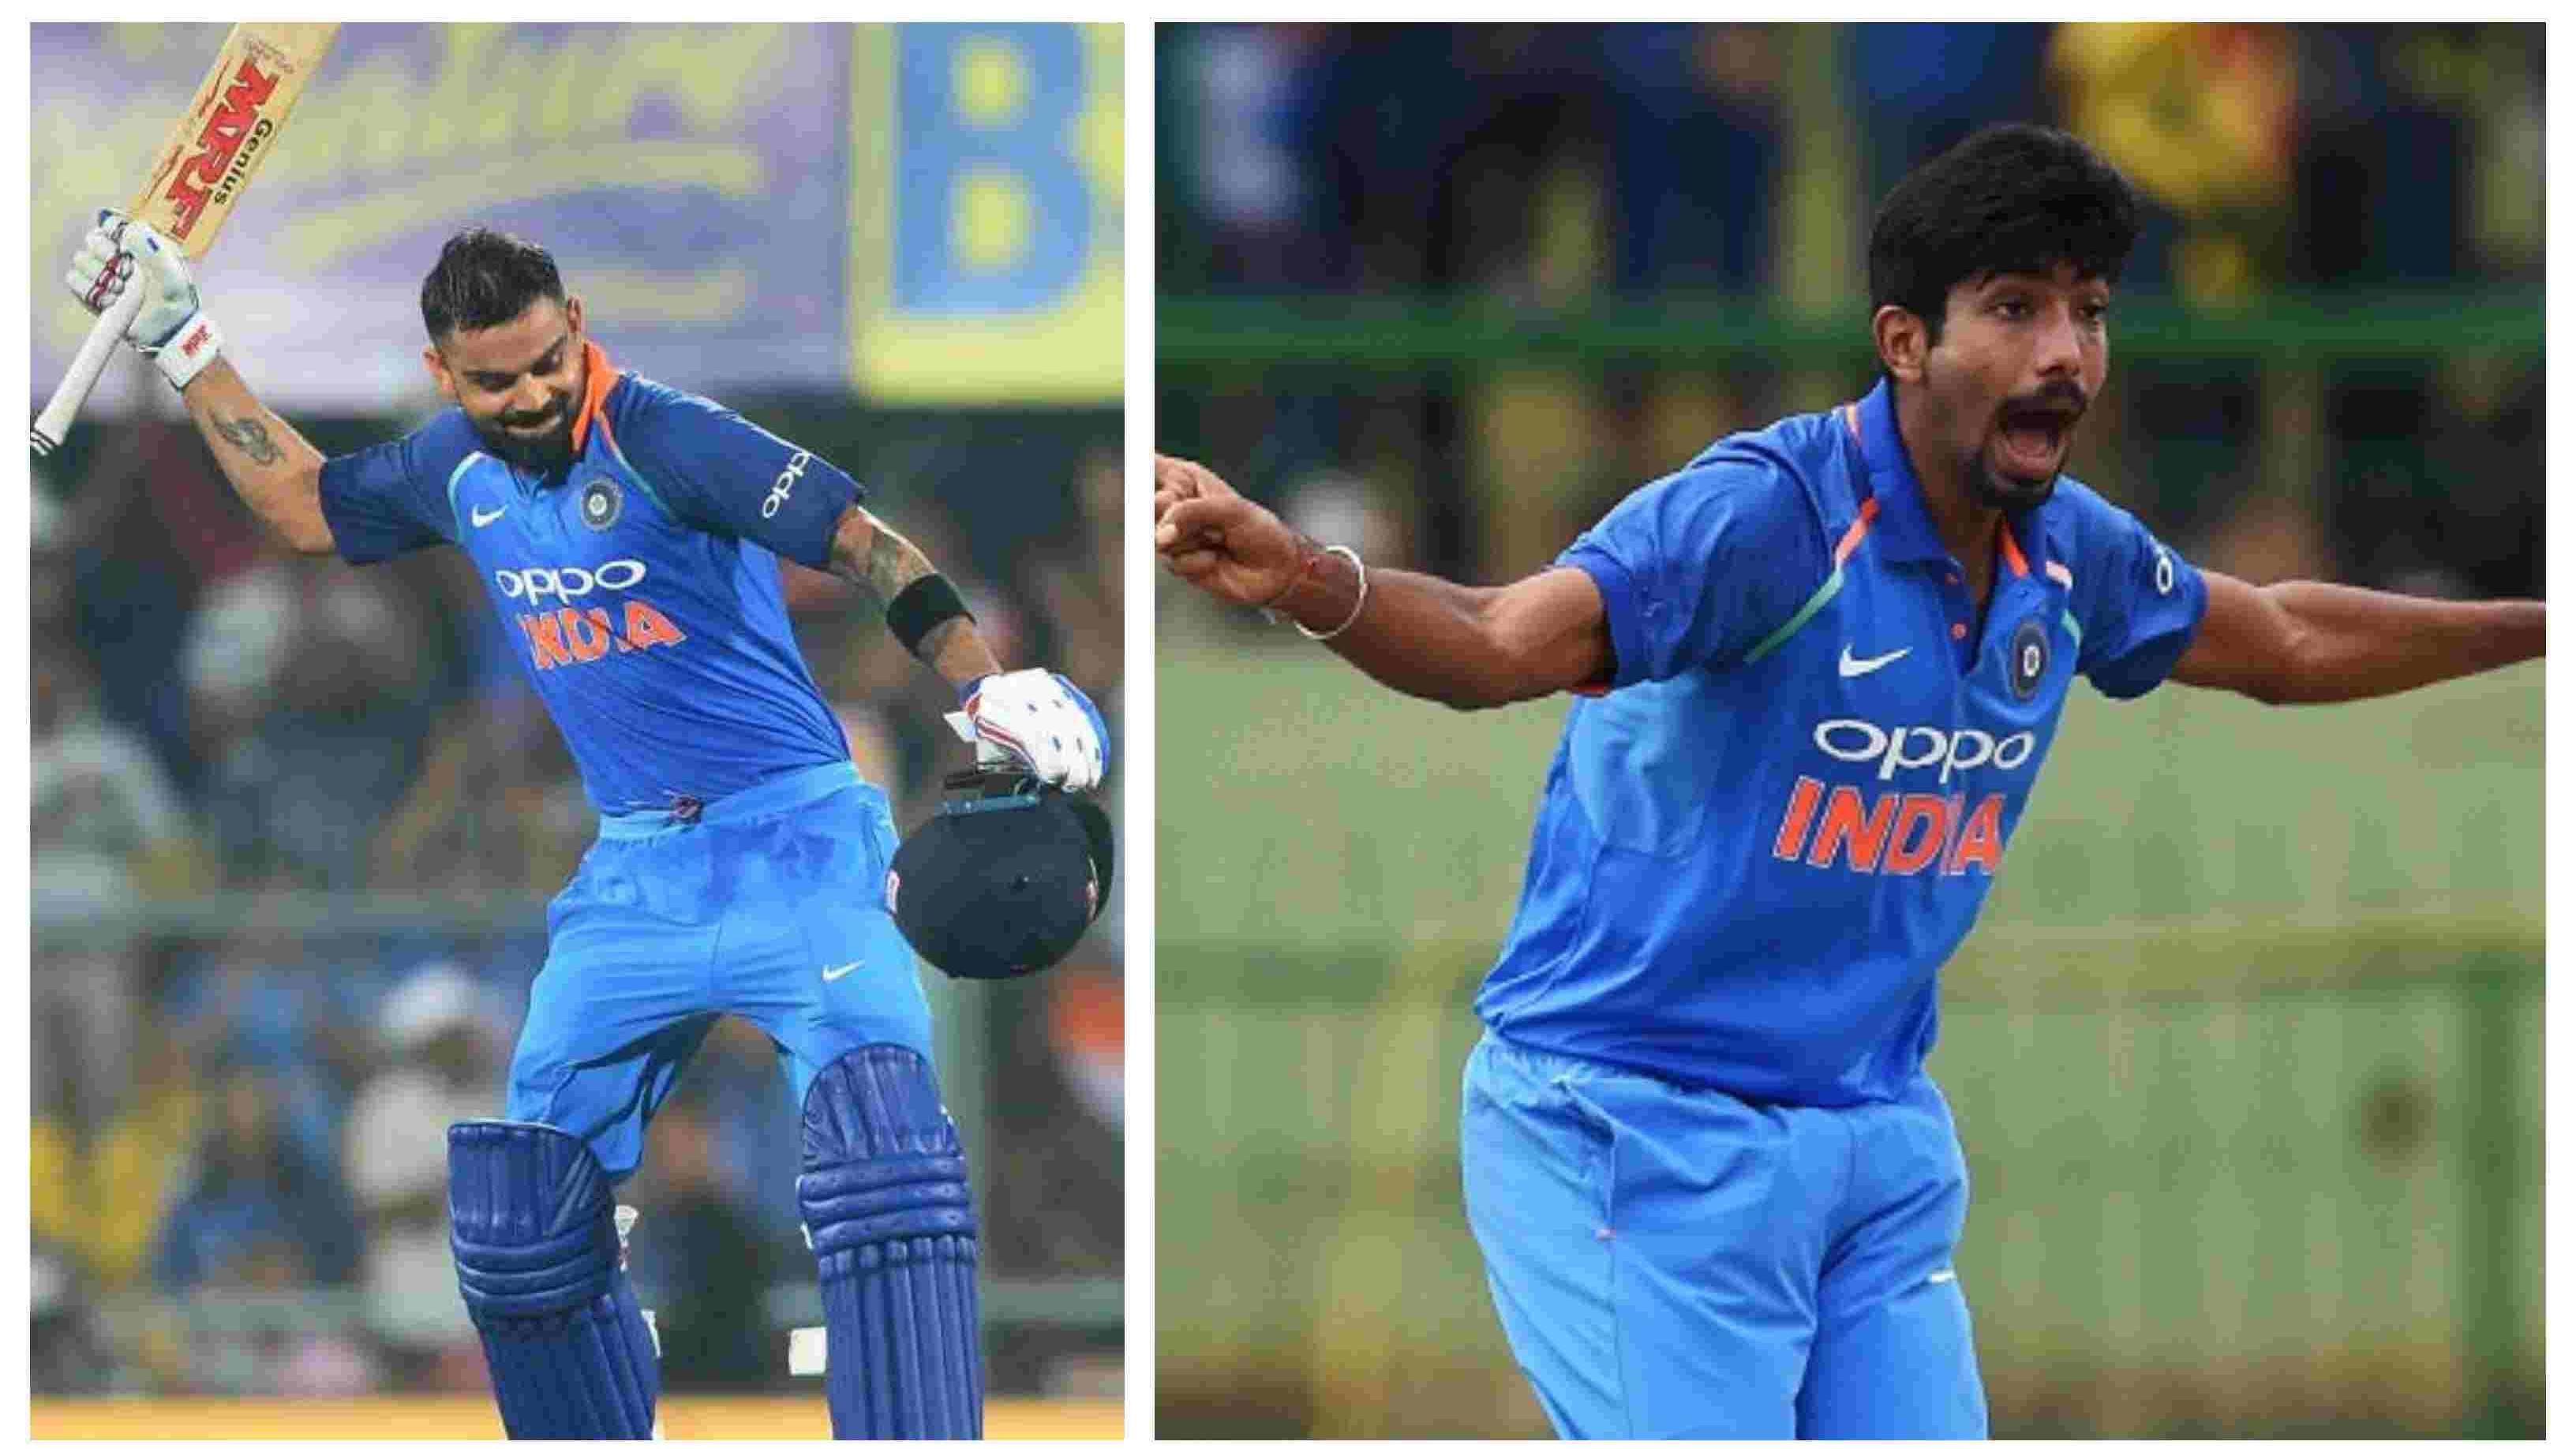 ICC Rankings: Virat Kohli, Jasprit Bumrah retain their positions as No. 1 ODI batsman and bowler